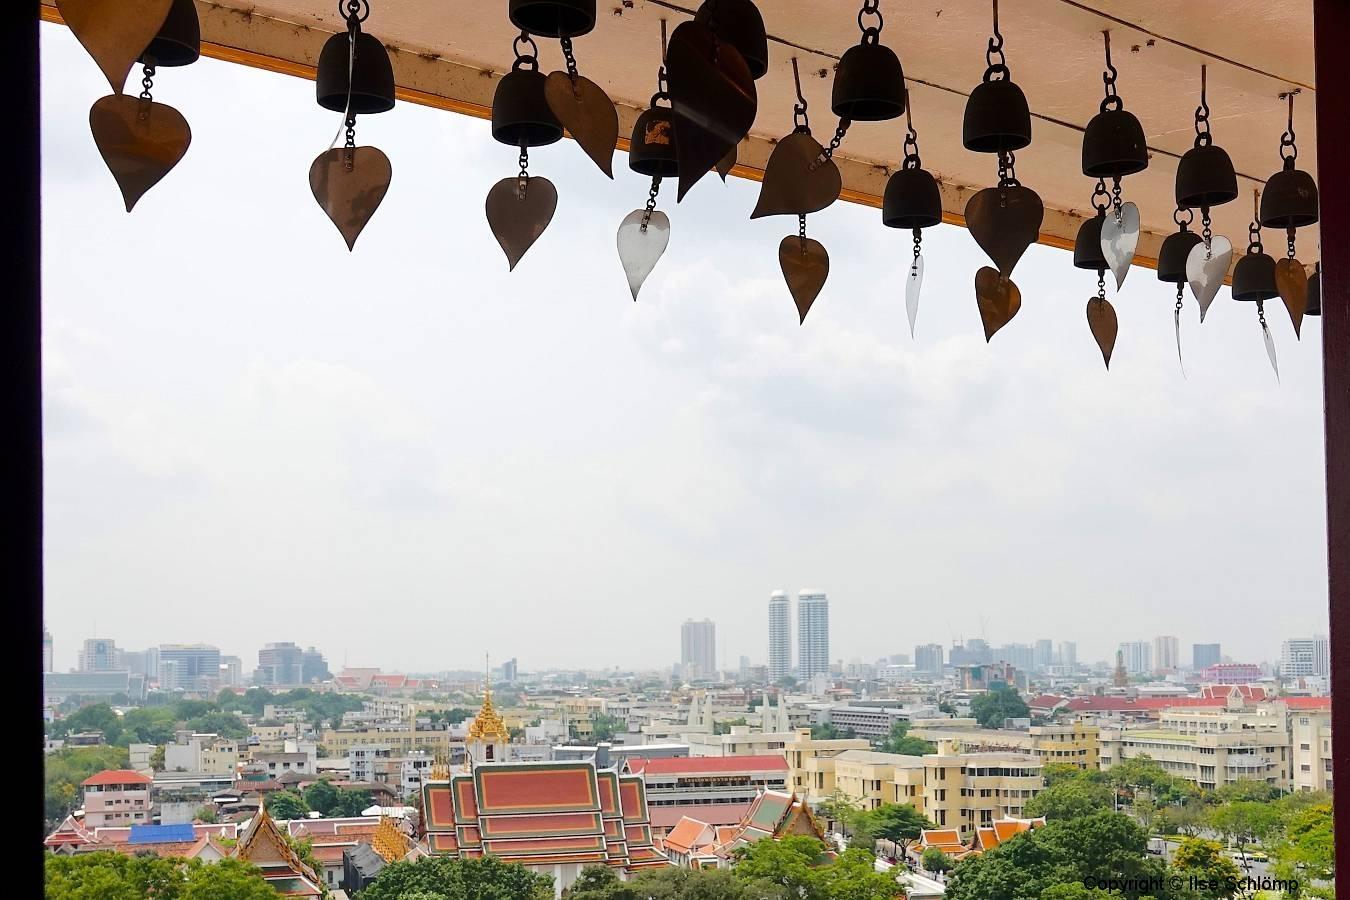 Thailand, Bangkok, Golden Mount